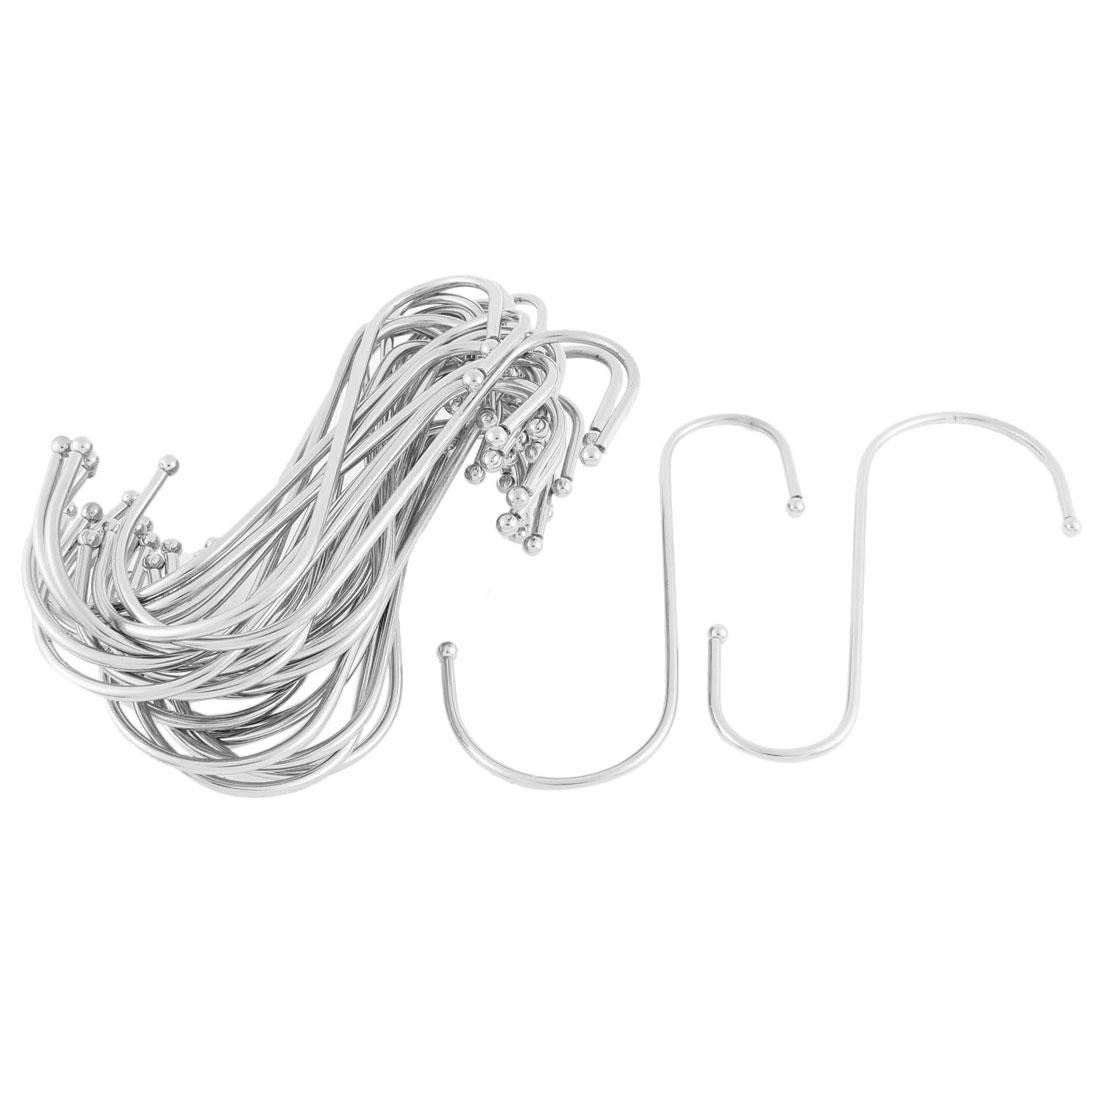 Wardrobe Scarf Hat S Shaped Hanging Hooks Hangers Holder Clasp 30pcs